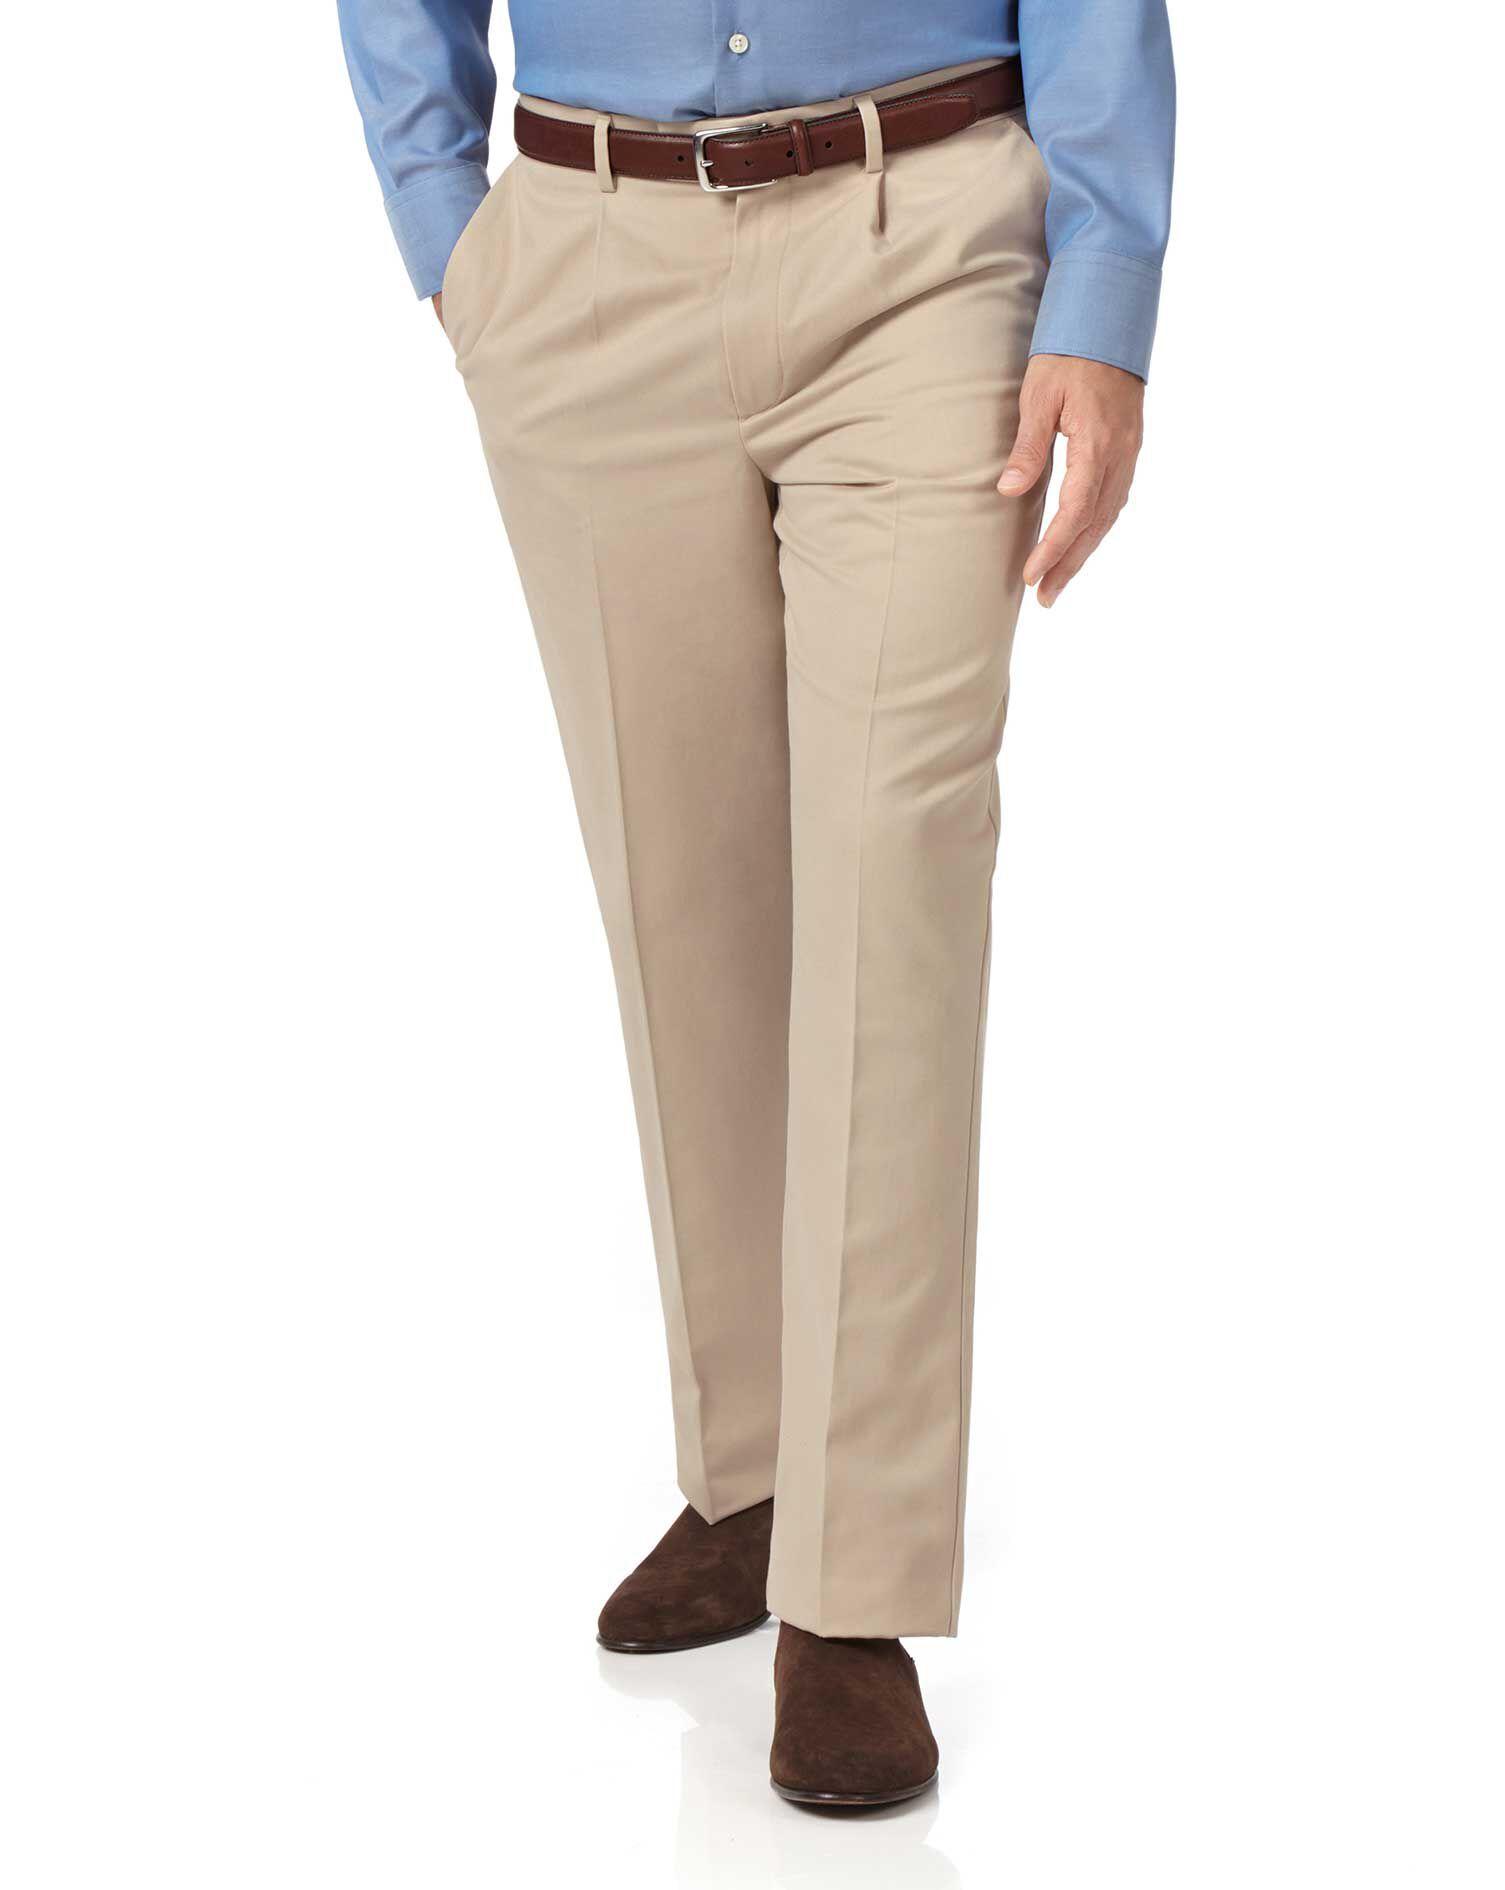 Pantalons Pantalons Sans Tyrwhitt Sans RepassageCharles Pantalons Chino RepassageCharles Chino Tyrwhitt bfY7gy6v